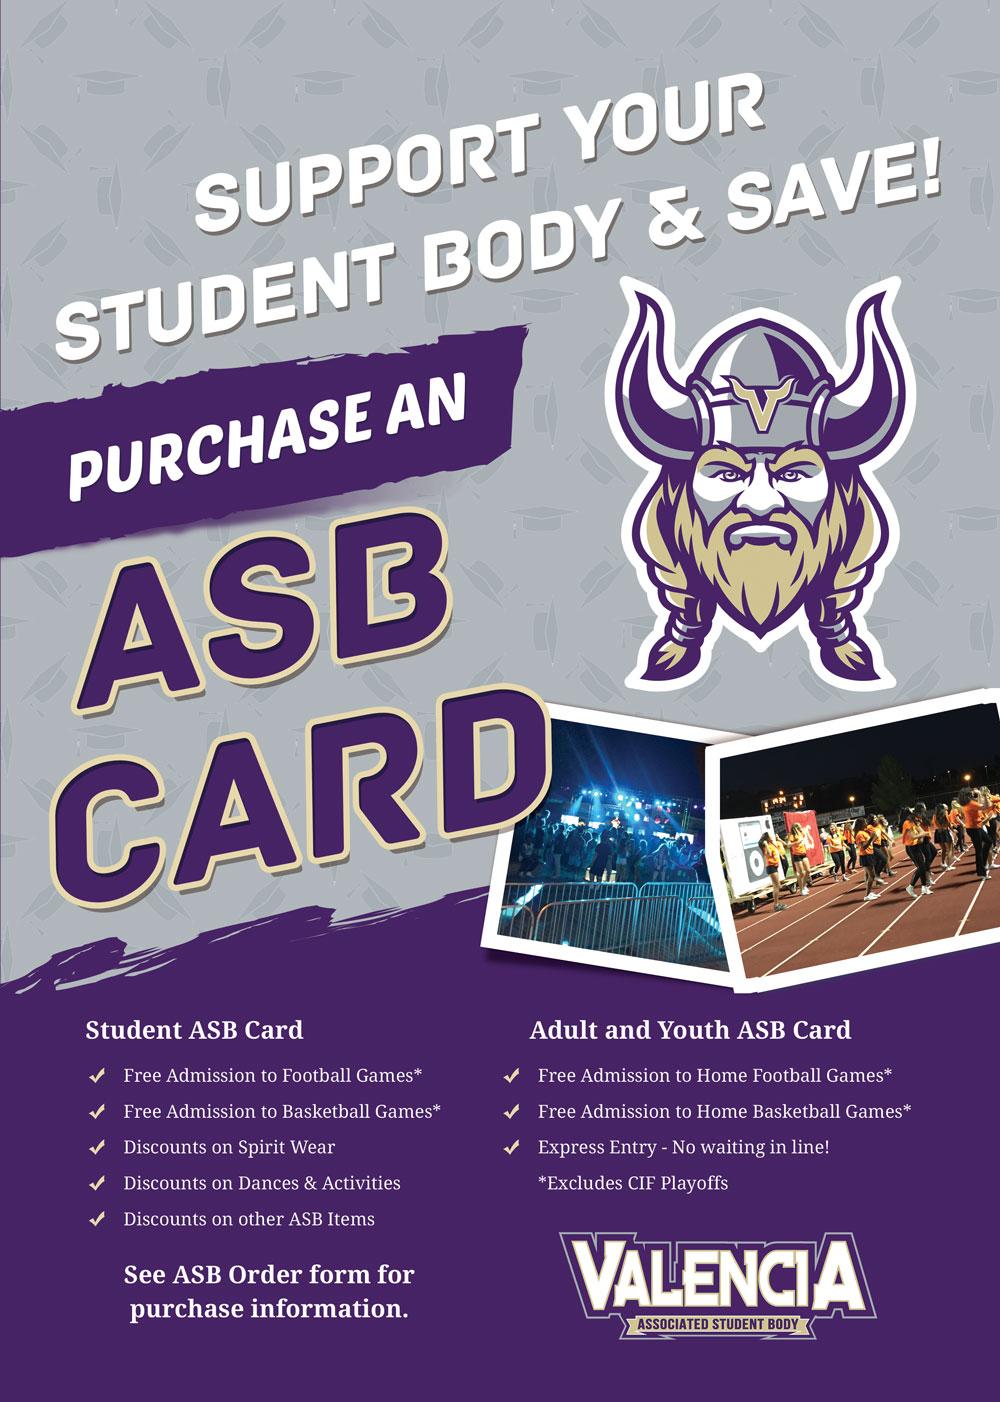 asb-card-flyer.jpg